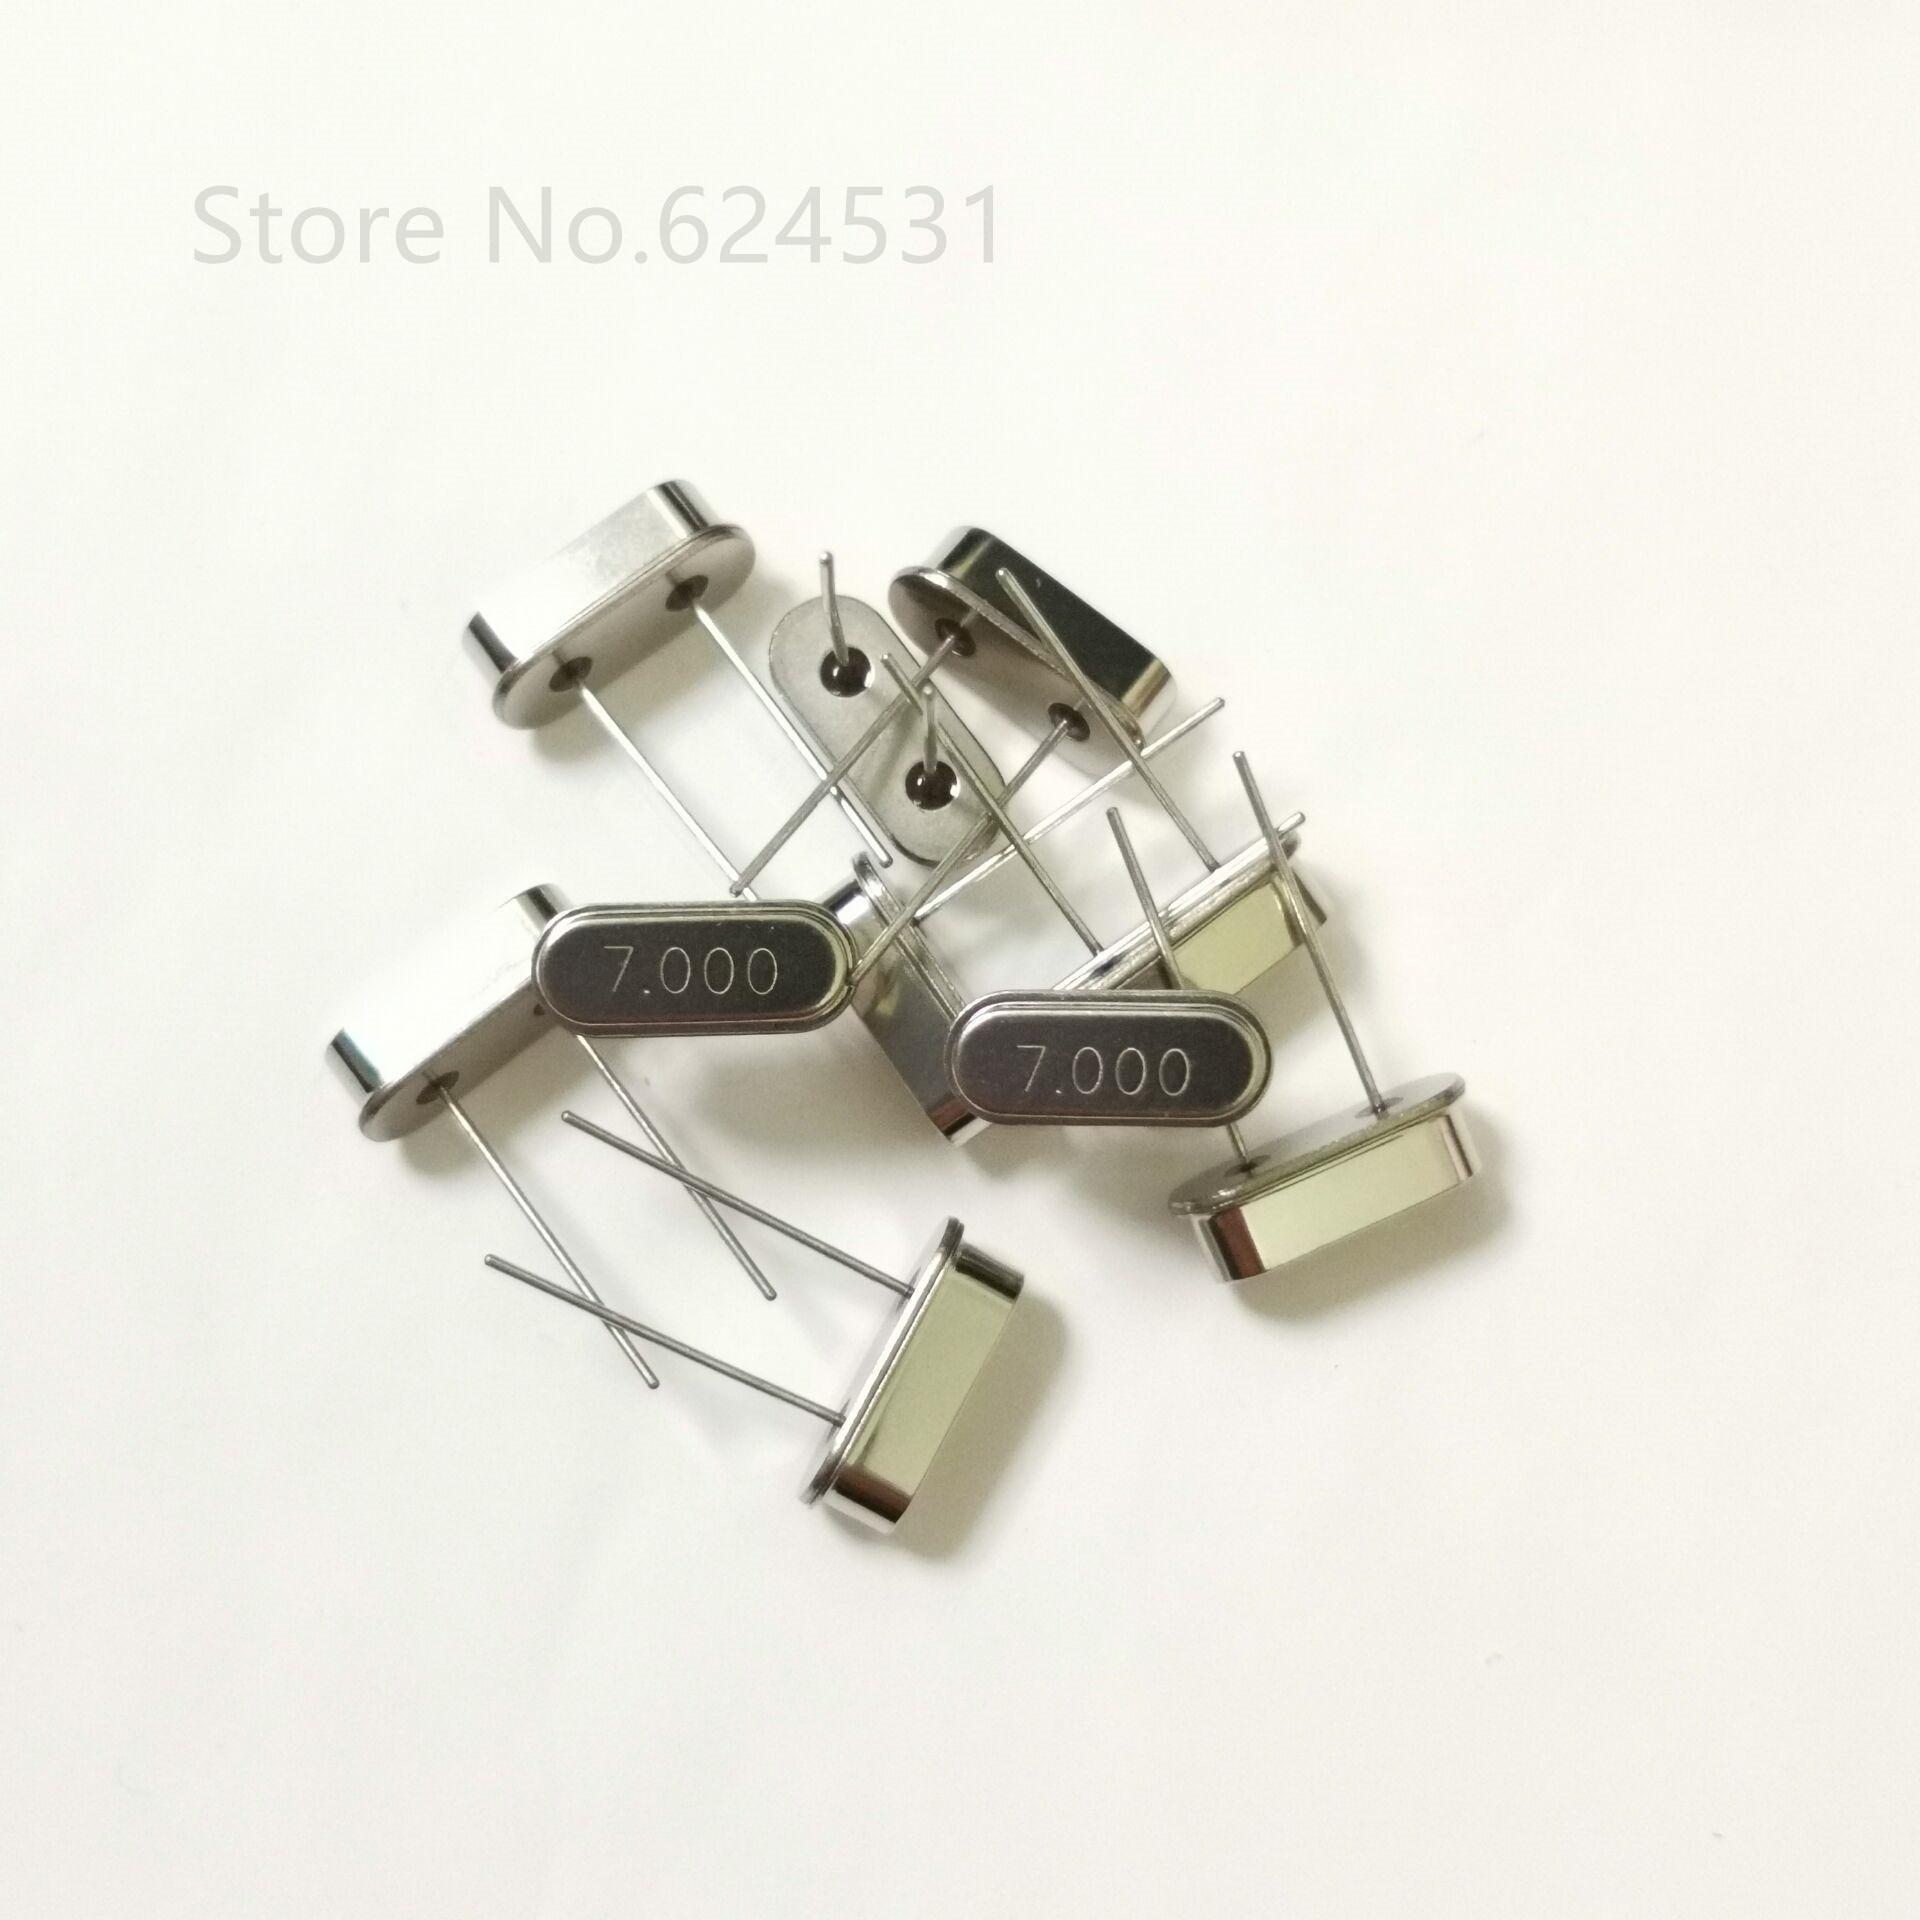 10pcs HC-49S Inline Passive Crystal Oscillator 7MHZ 7.000MHZ 7M Resonator